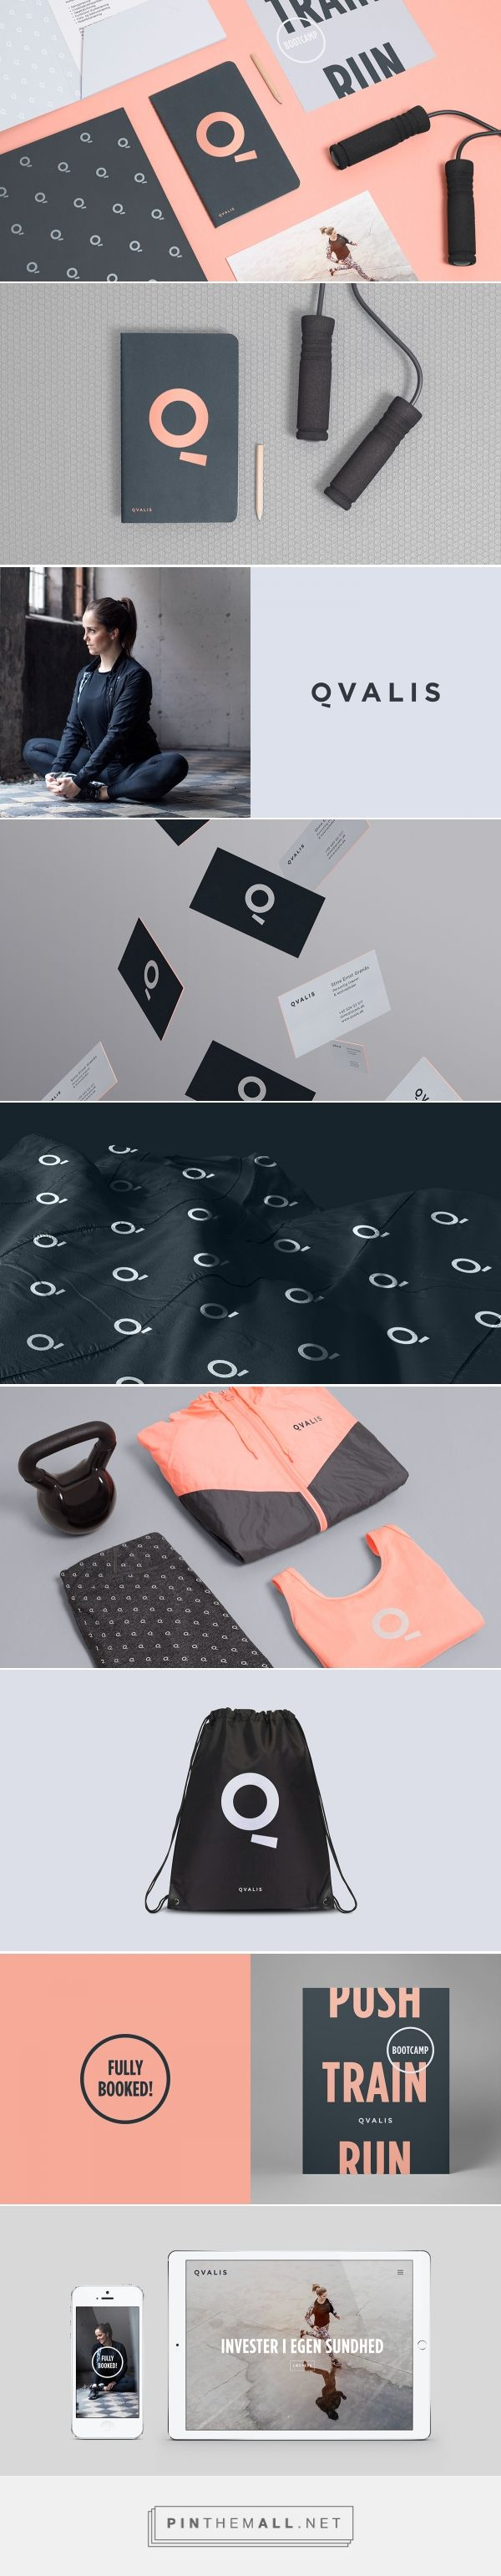 Qvalis Visual Identity on Behance | Fivestar Branding – Design and Branding Agency & Inspiration Gallery                                                                                                                                                                                 More